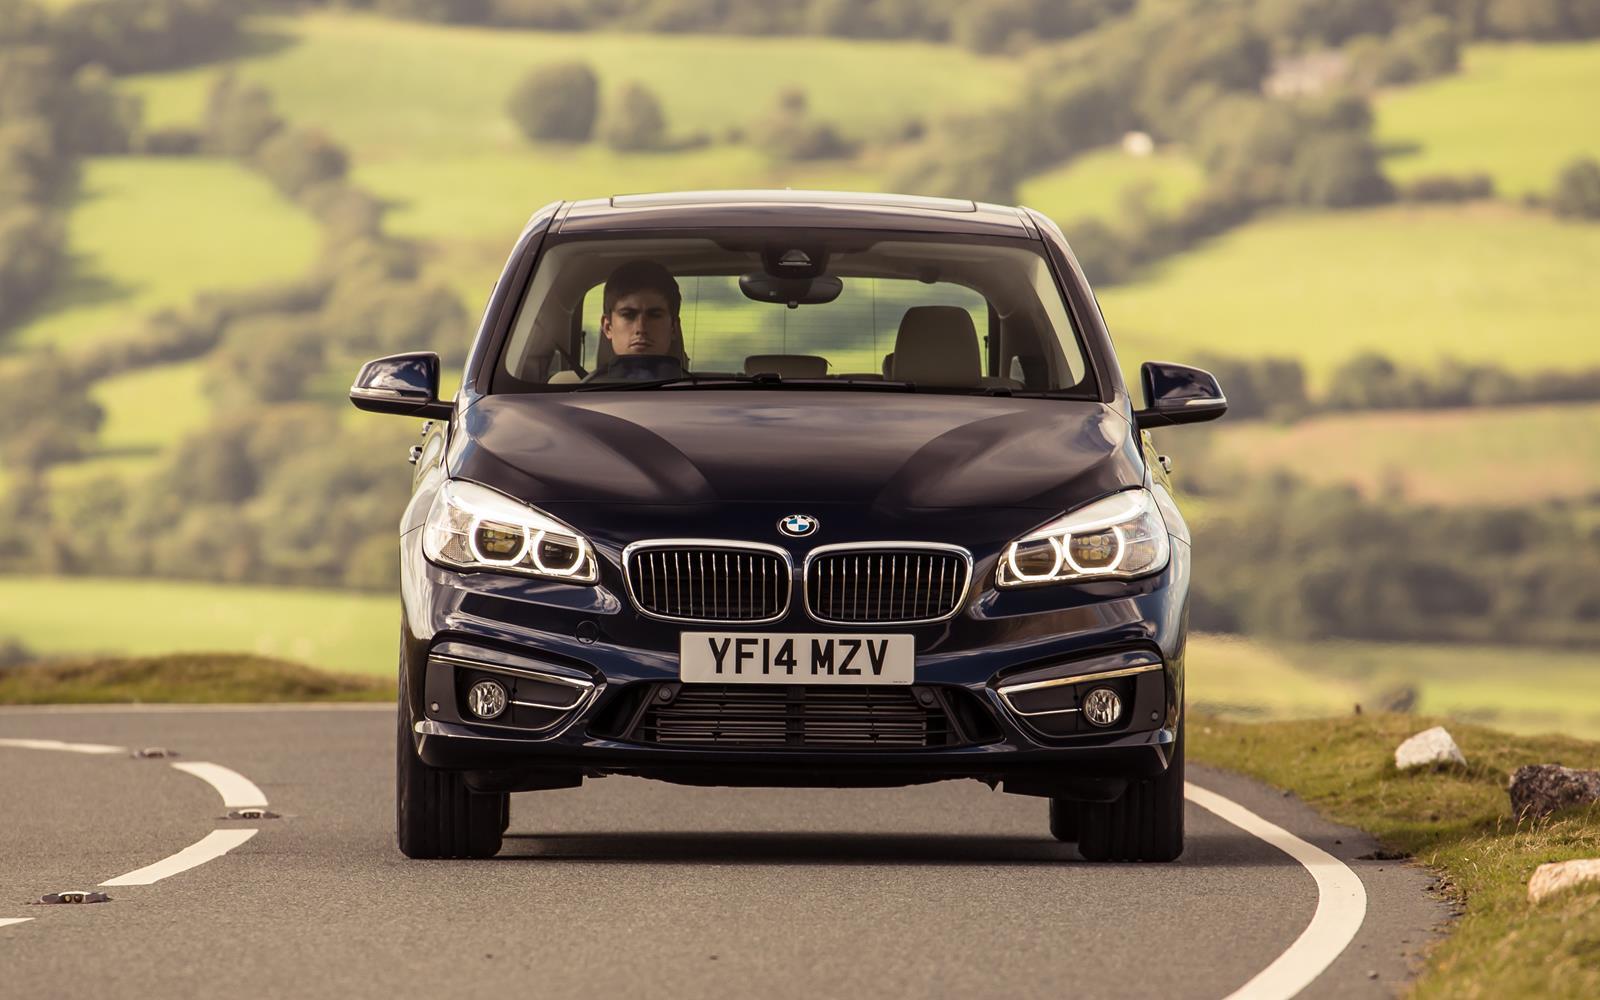 BMW 2 Series Active Tourer 2014 Front FrontSeatDriver.co.uk